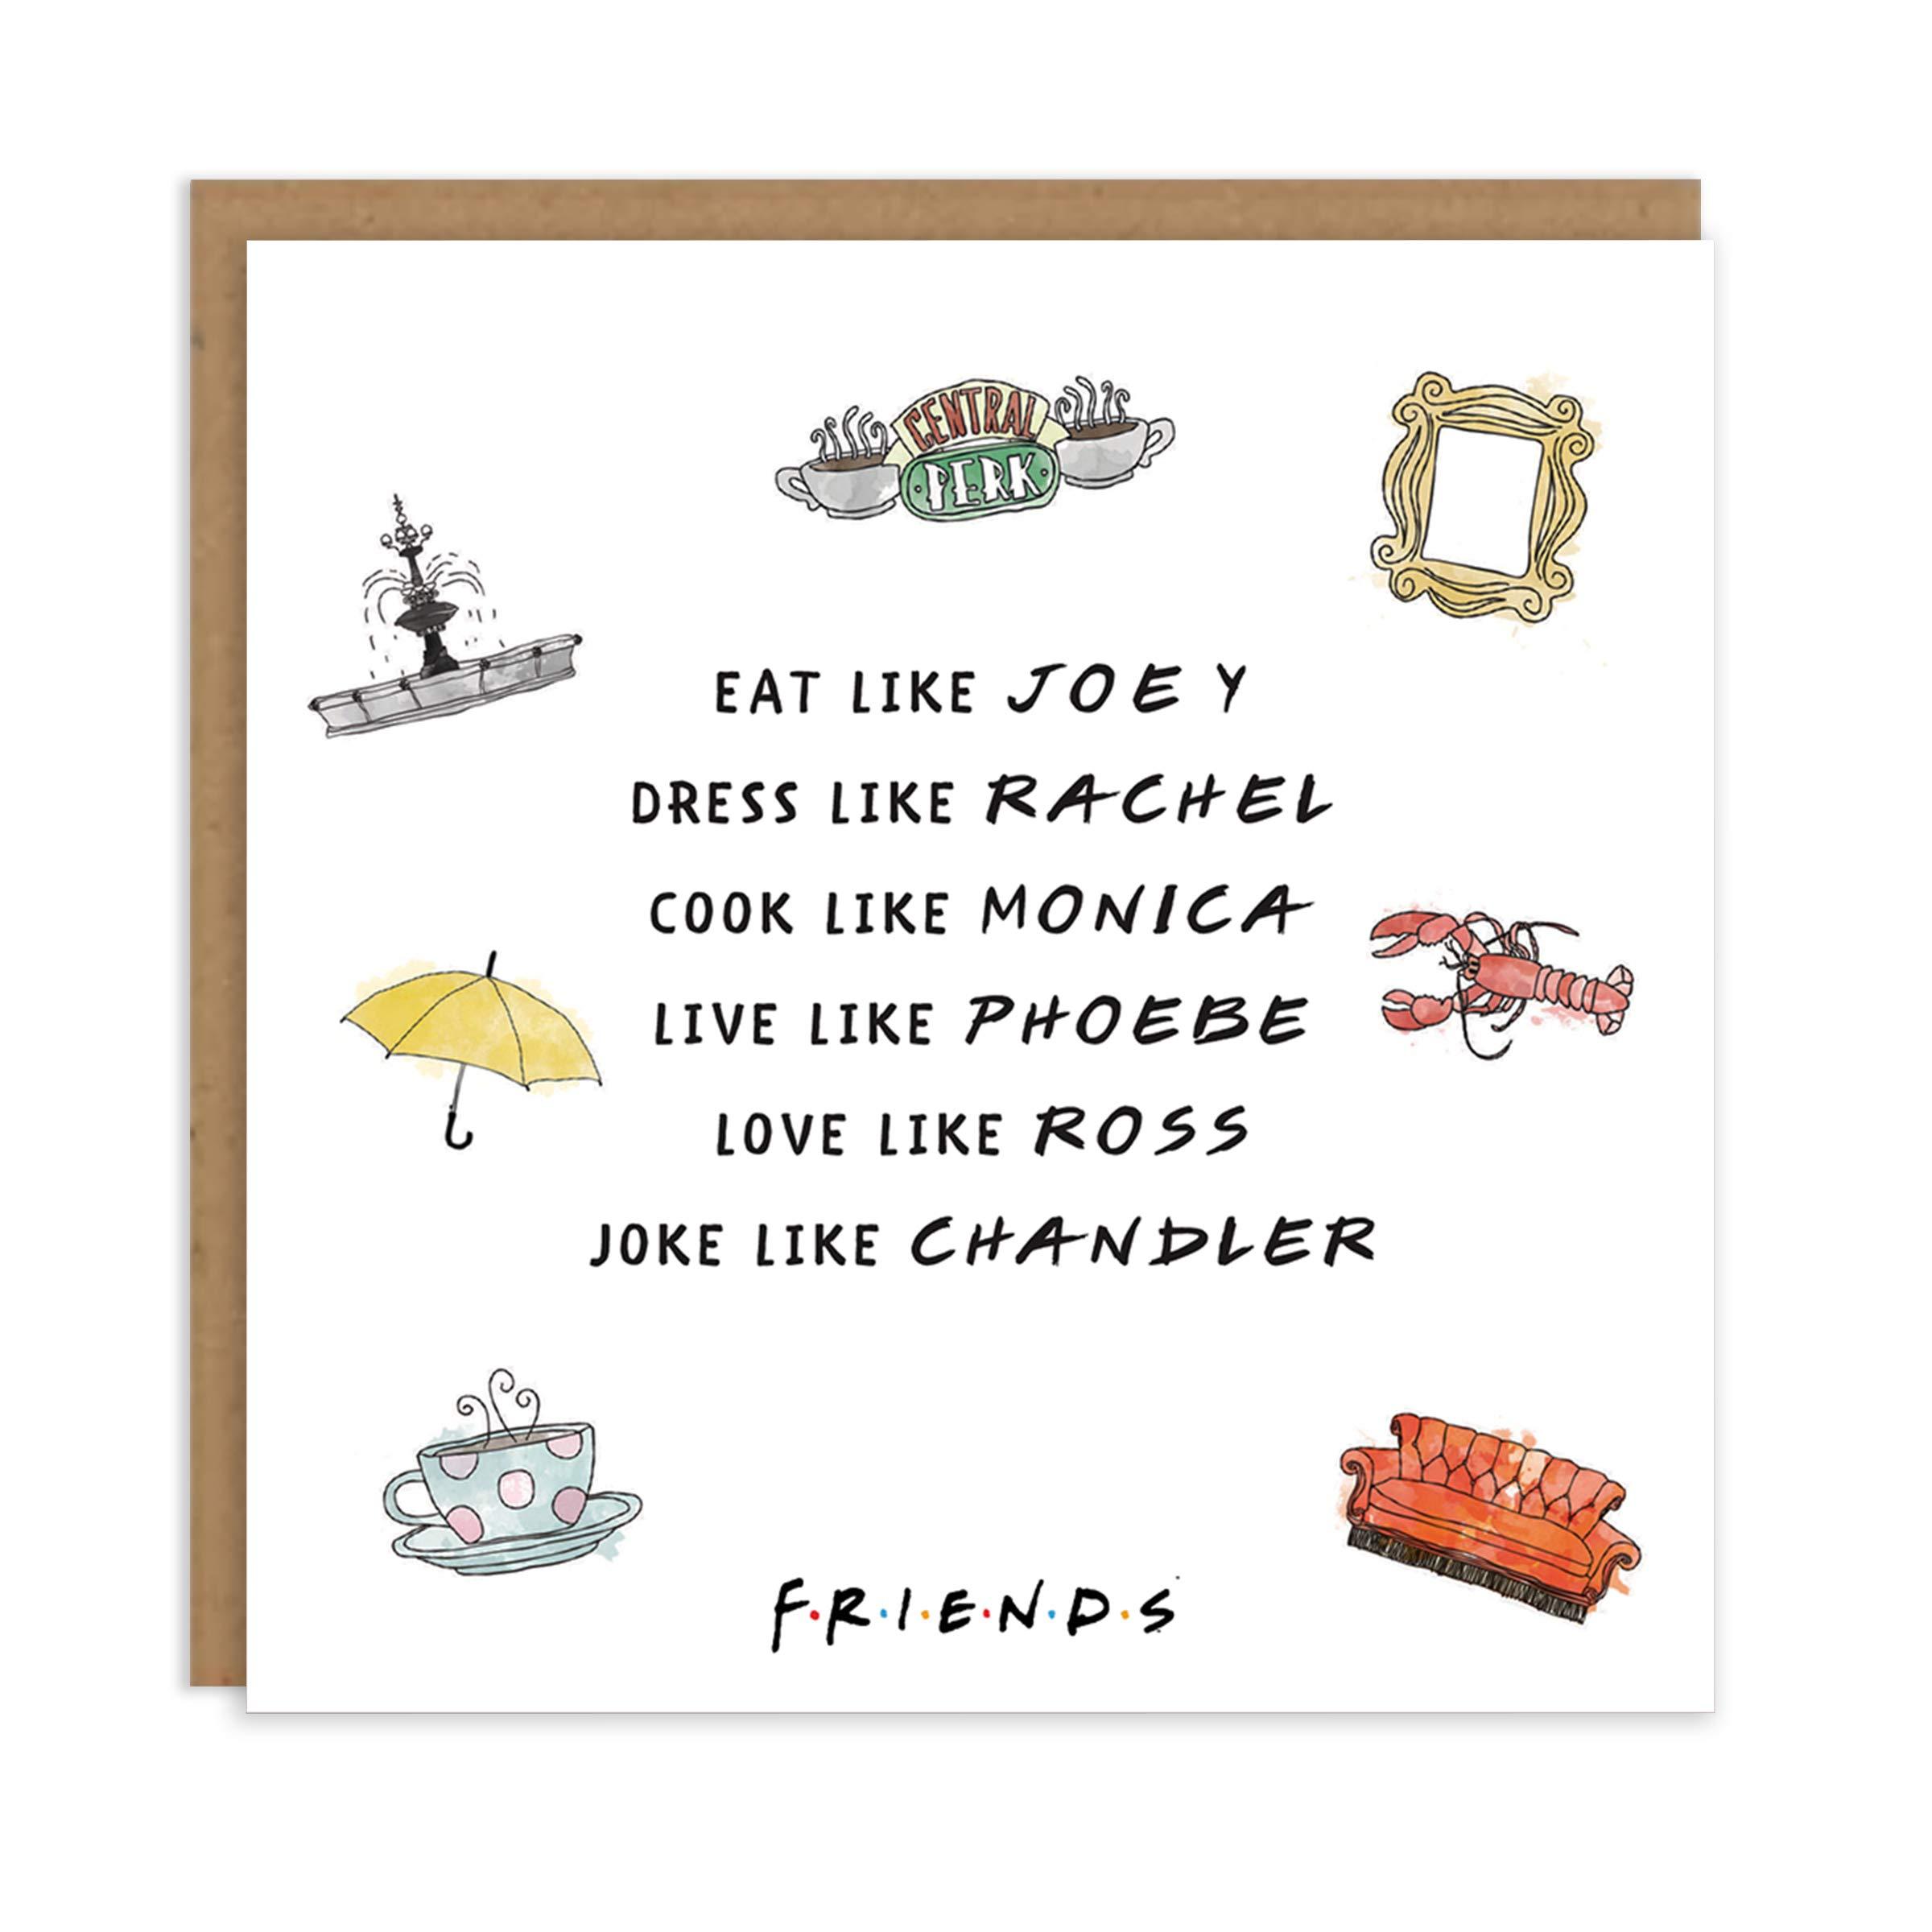 "Friends TV Show Birthday Card -""Eat Like Joey, Dress Like Rachel, Cook Like Monica, Live Like Phoebe, Love Like Ross, Joke Like Chandler""   Officially Licensed Friends Merchandise   Cardology"